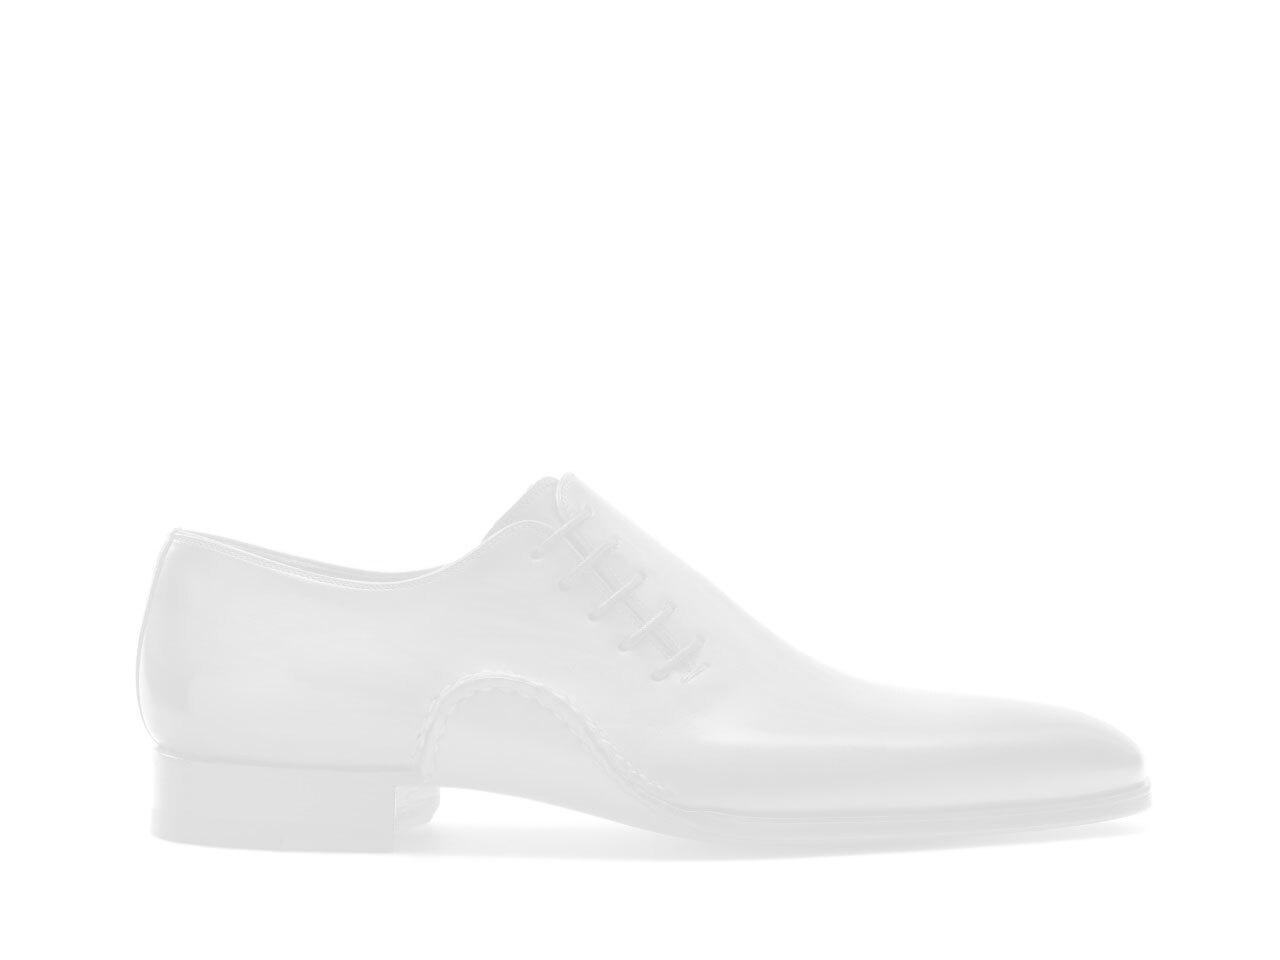 Sole of the Magnanni Cesar Black Patent Men's Oxford Shoes